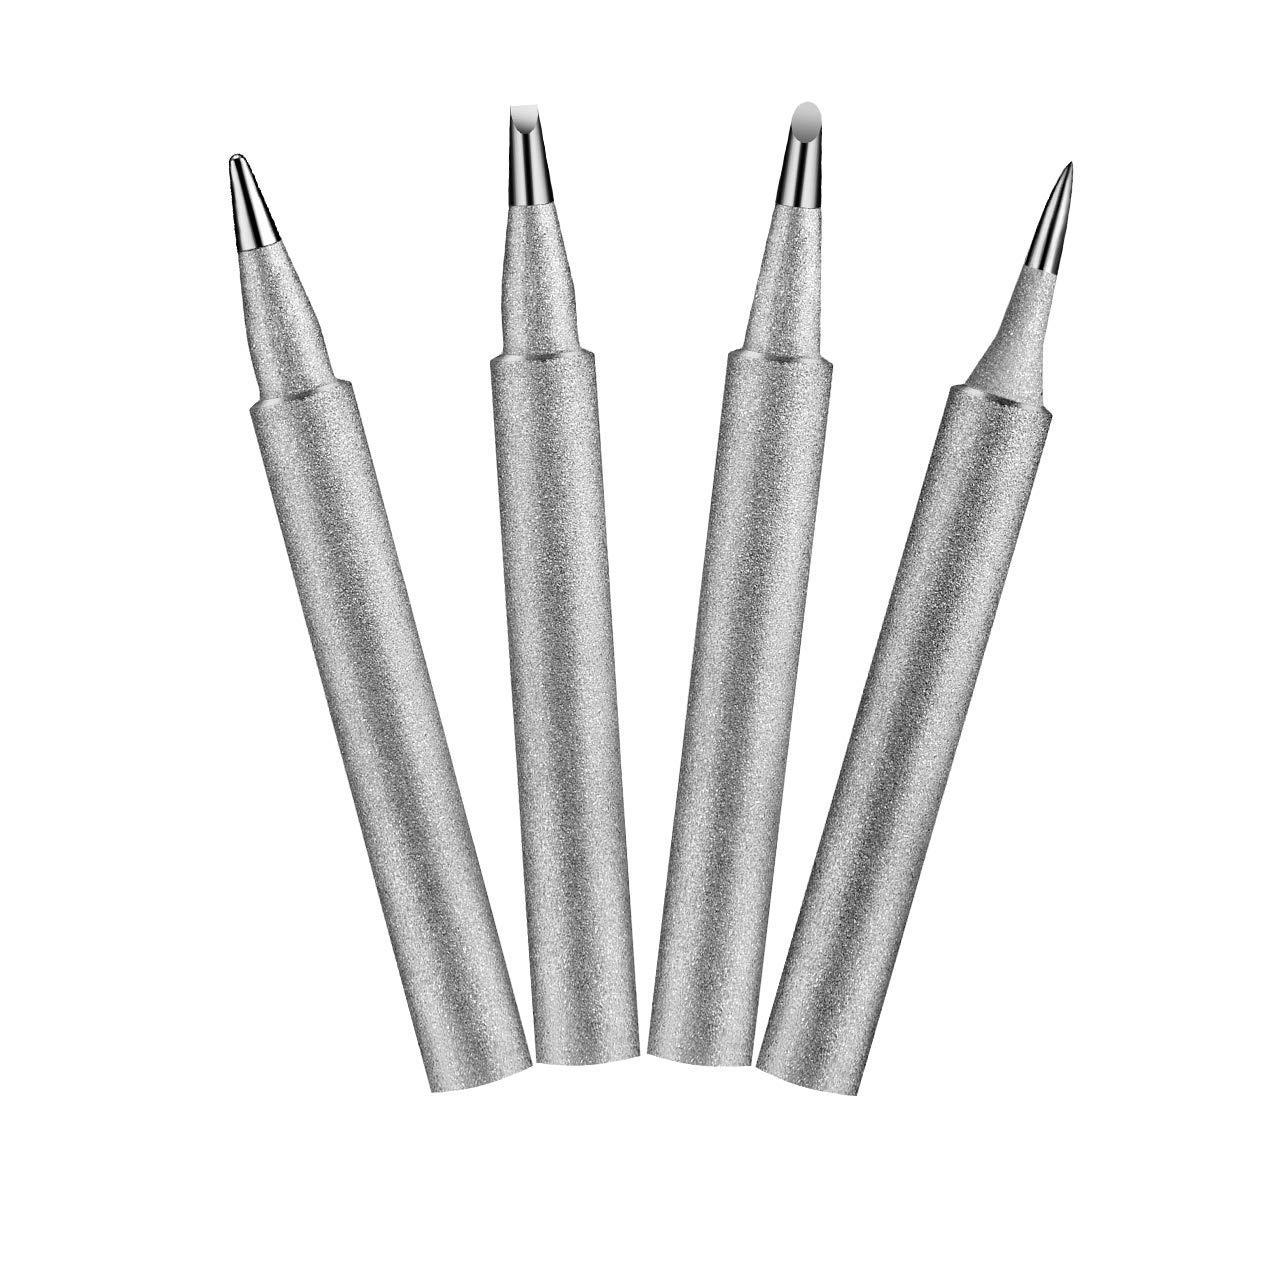 TOPELEK 4Pcs Replacement Soldering Iron Tips